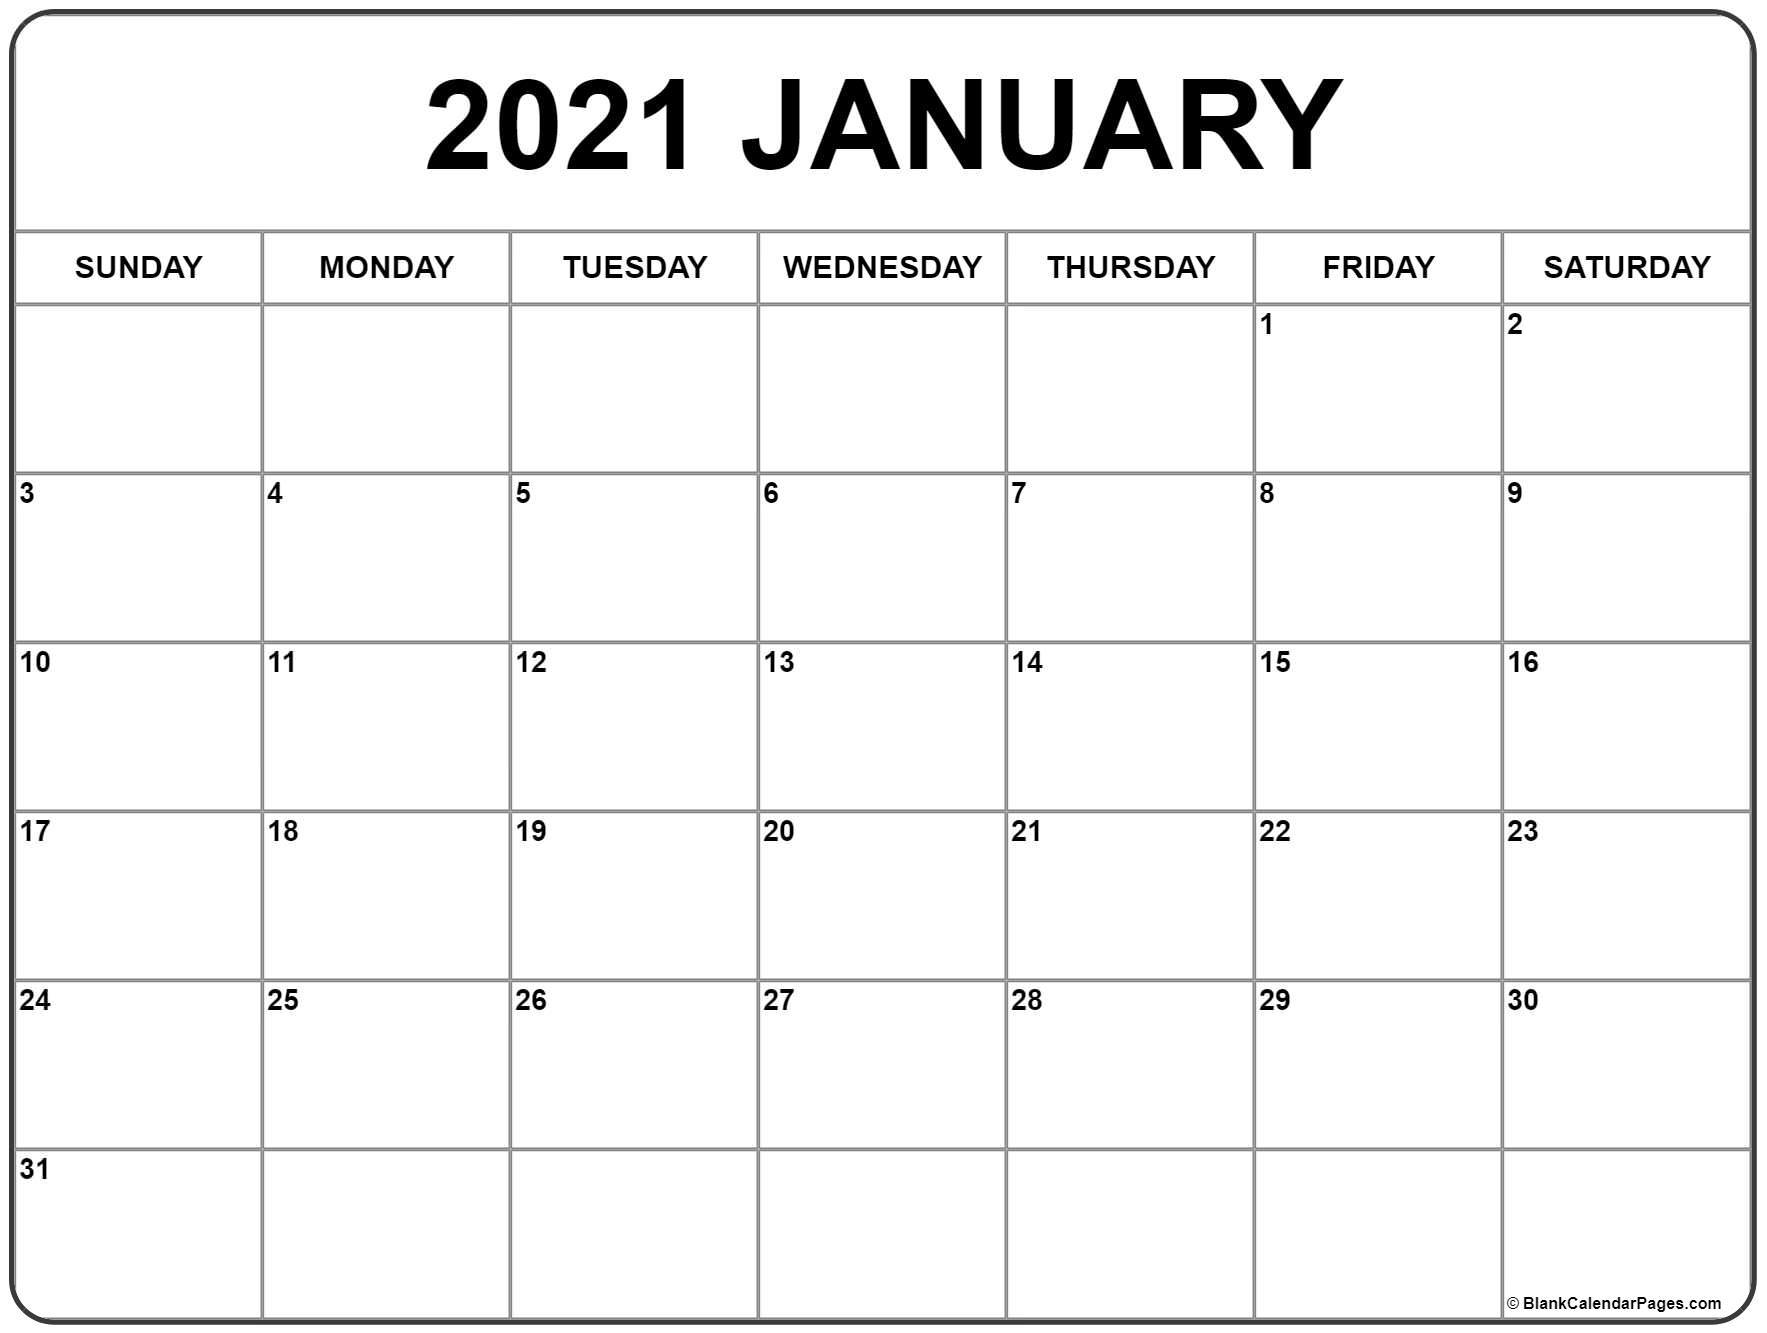 Free January 2021 Printable Calendar Template